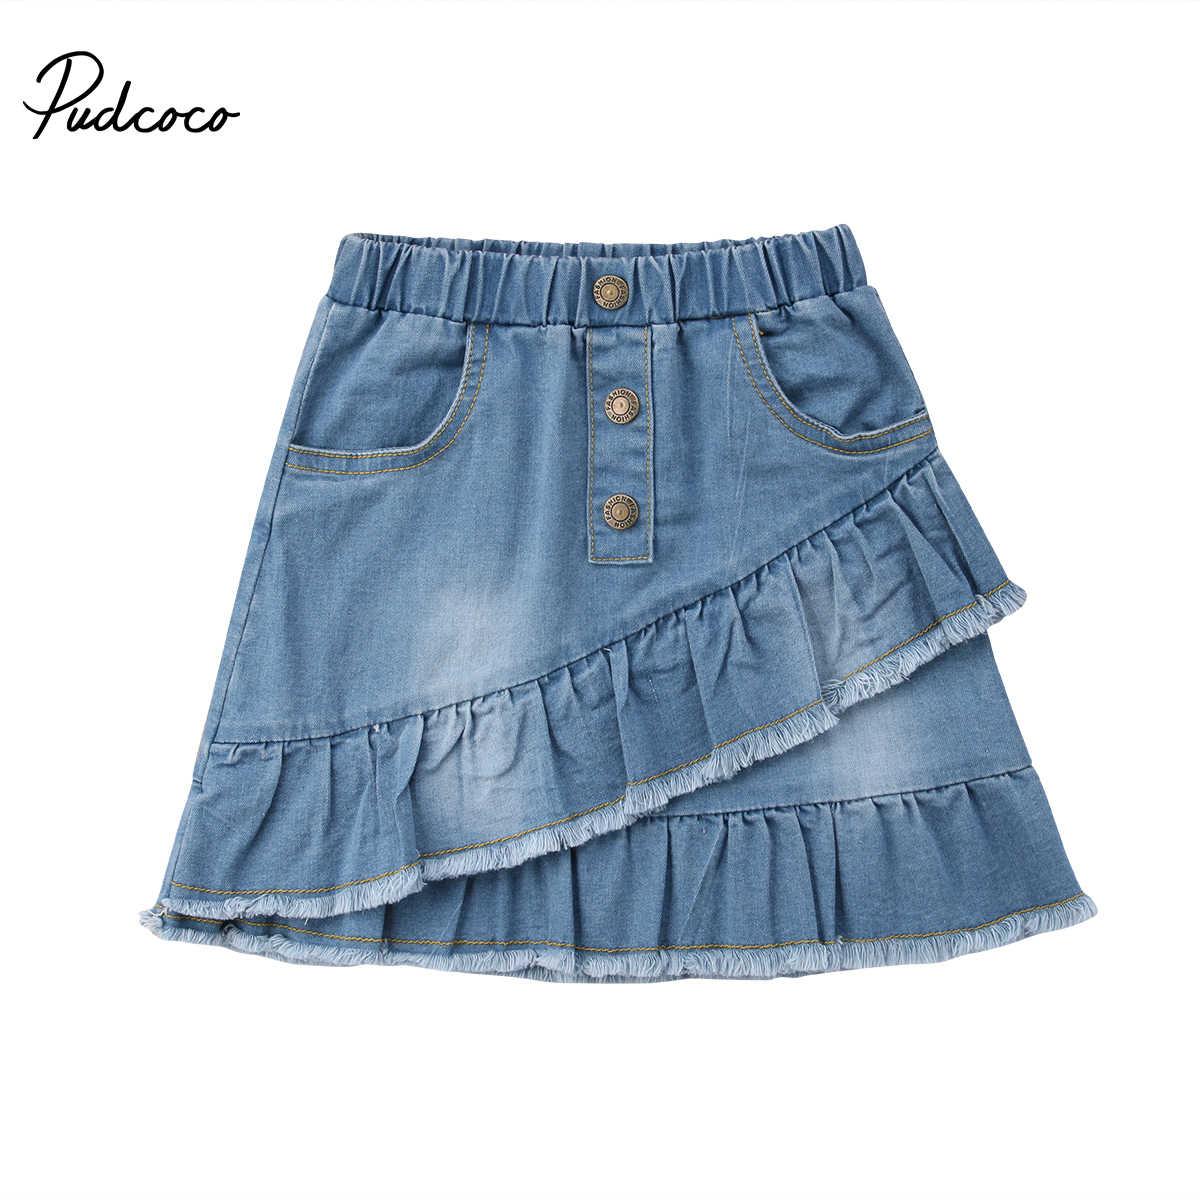 d41adea9ca Kids Button Skirt Jeans for Girl Denim Mini Skirt Casual Fashion Baby Girl  Cute Toddler Blue